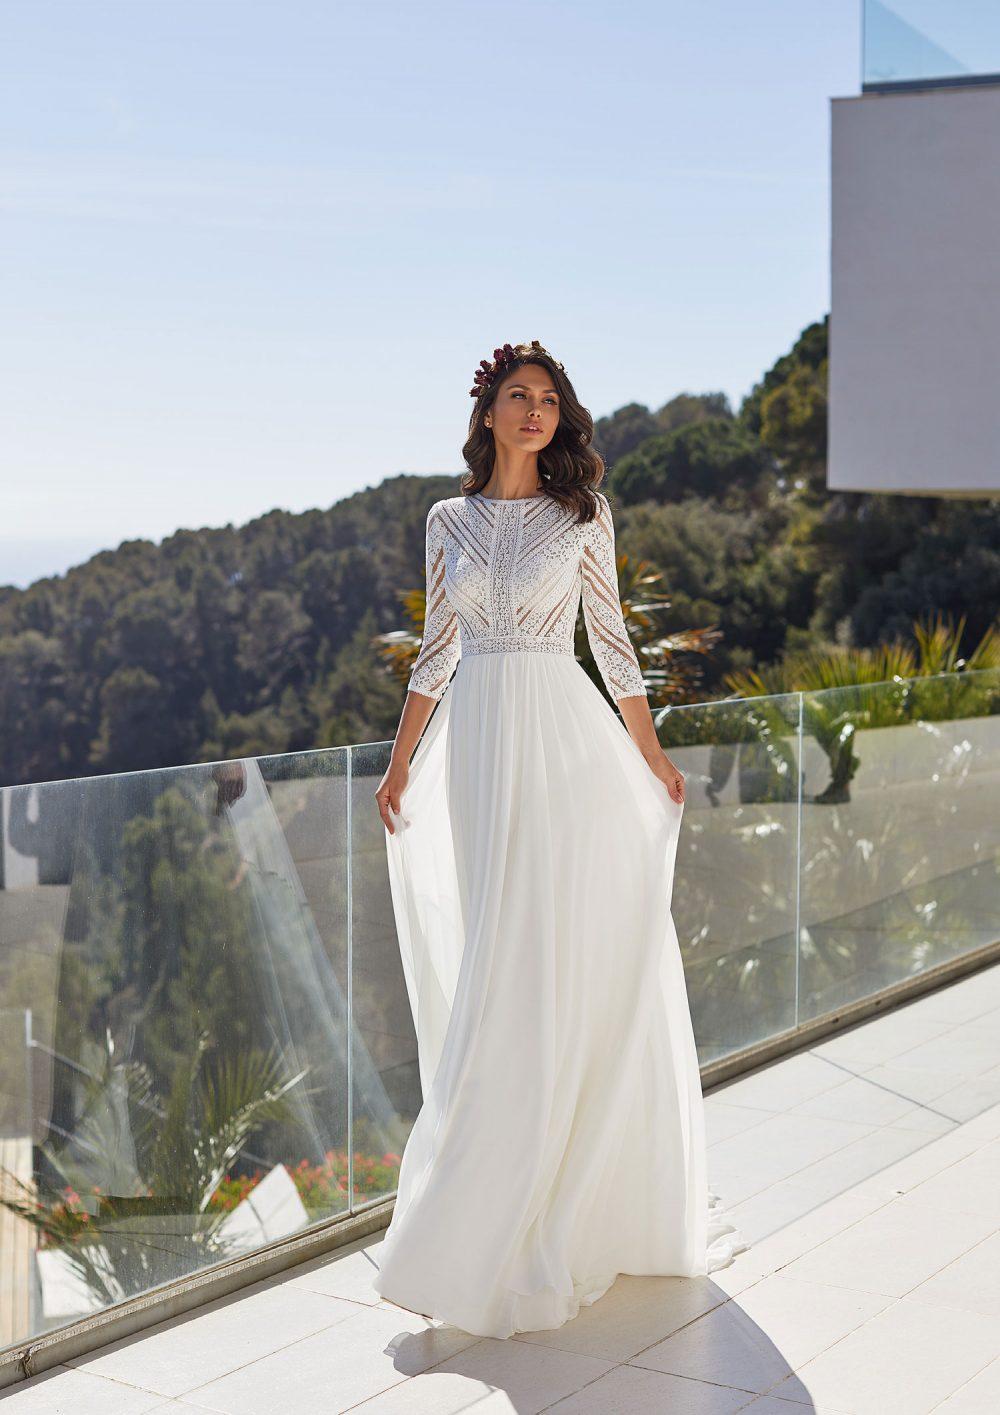 Mariages: abito da sposa Pronovias 2021 a Vicenza, Verona, Padova, Veneto BEA